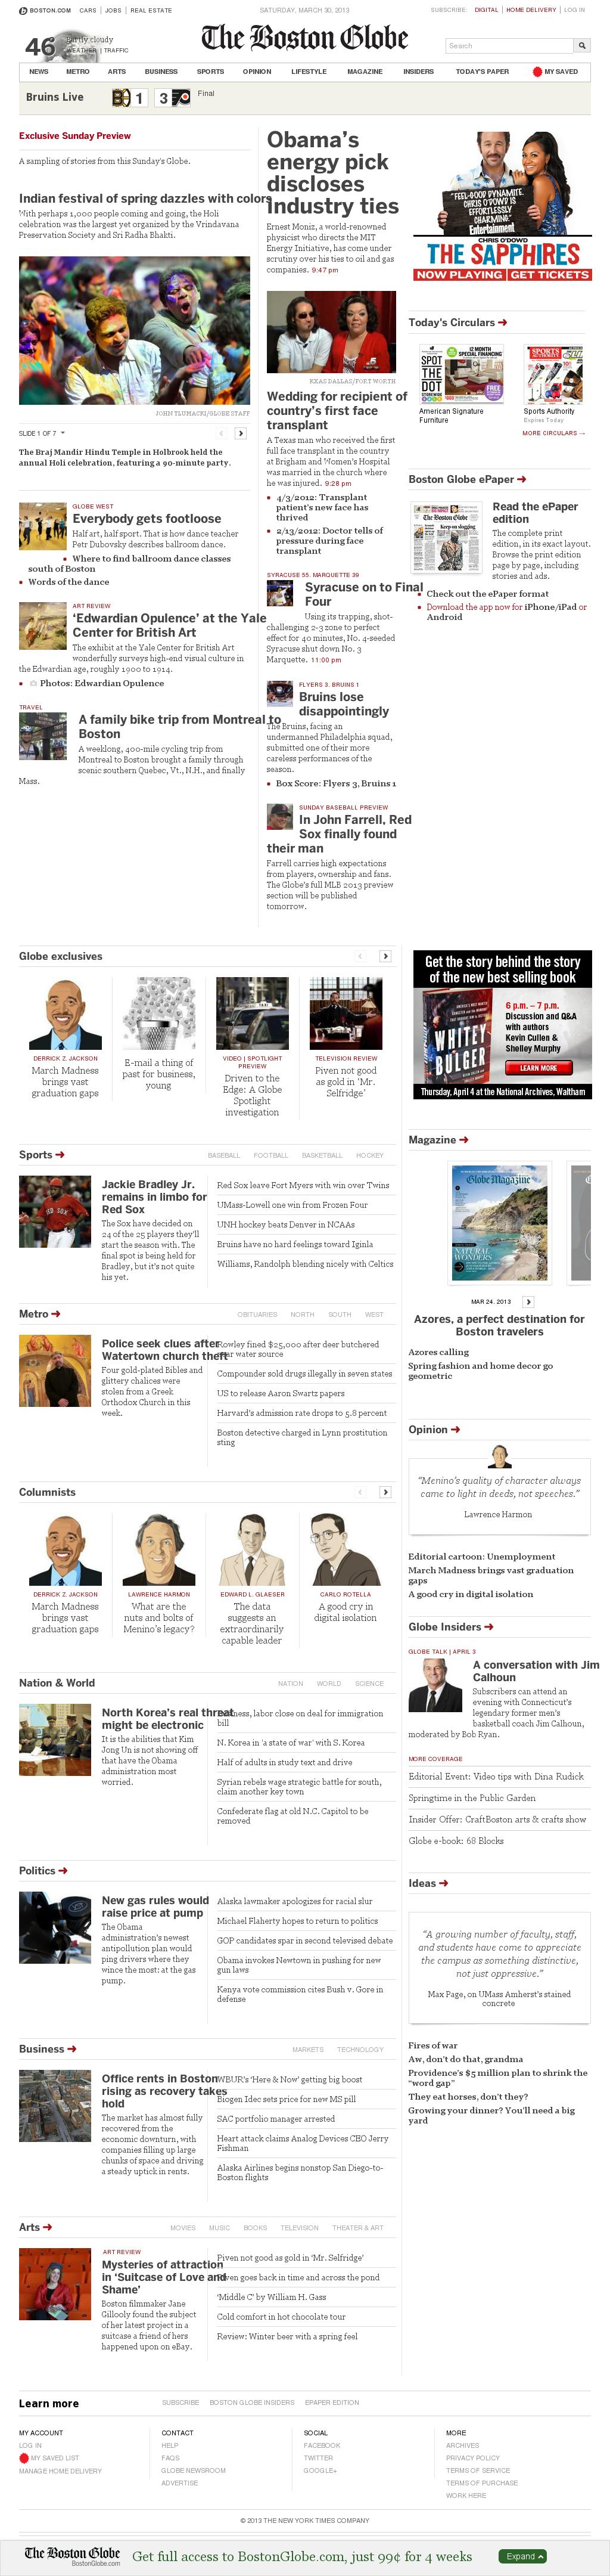 The Boston Globe at Sunday March 31, 2013, 12:02 a.m. UTC